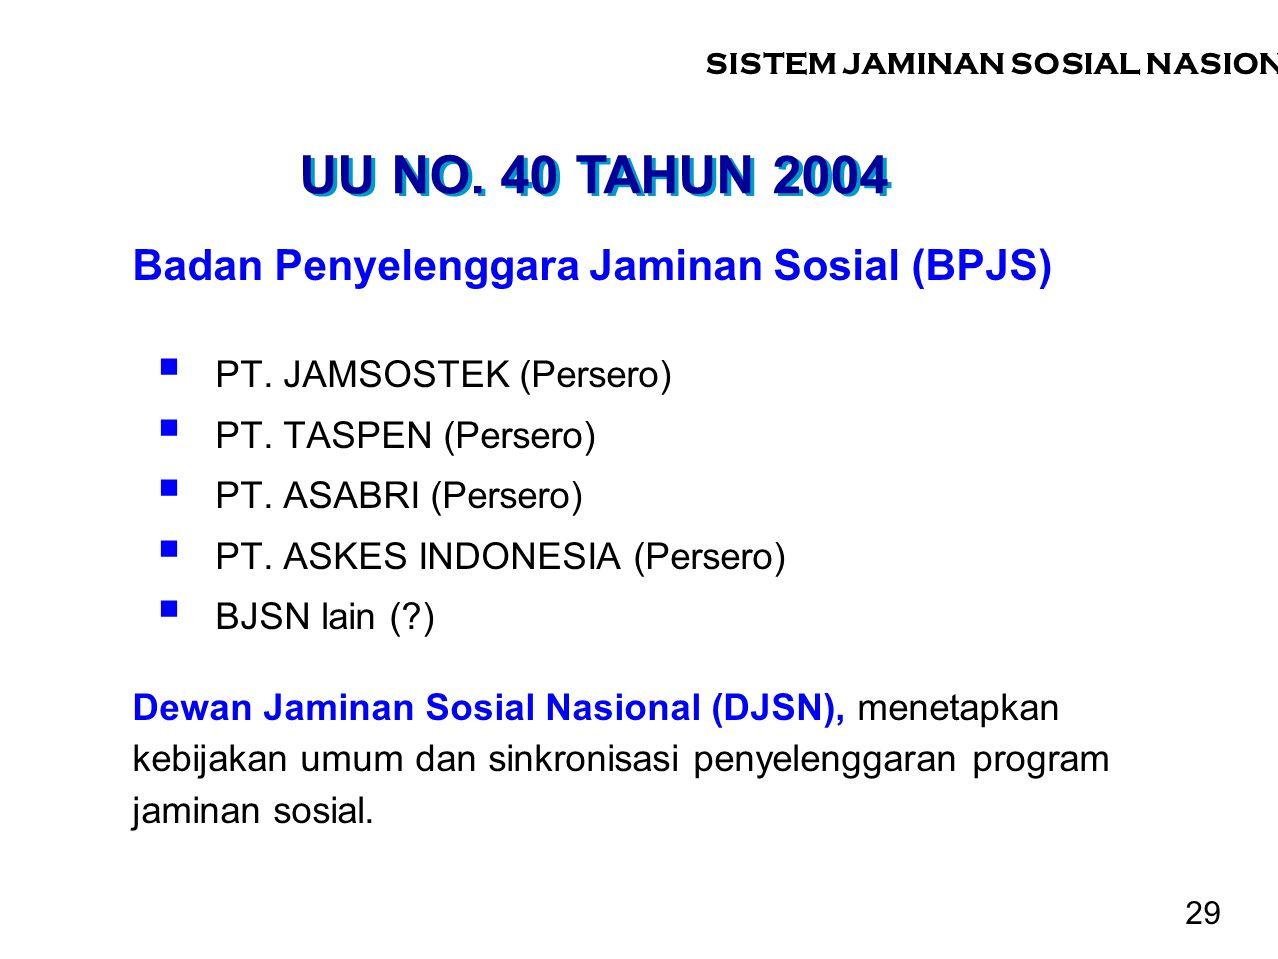 UU NO. 40 TAHUN 2004 Badan Penyelenggara Jaminan Sosial (BPJS)